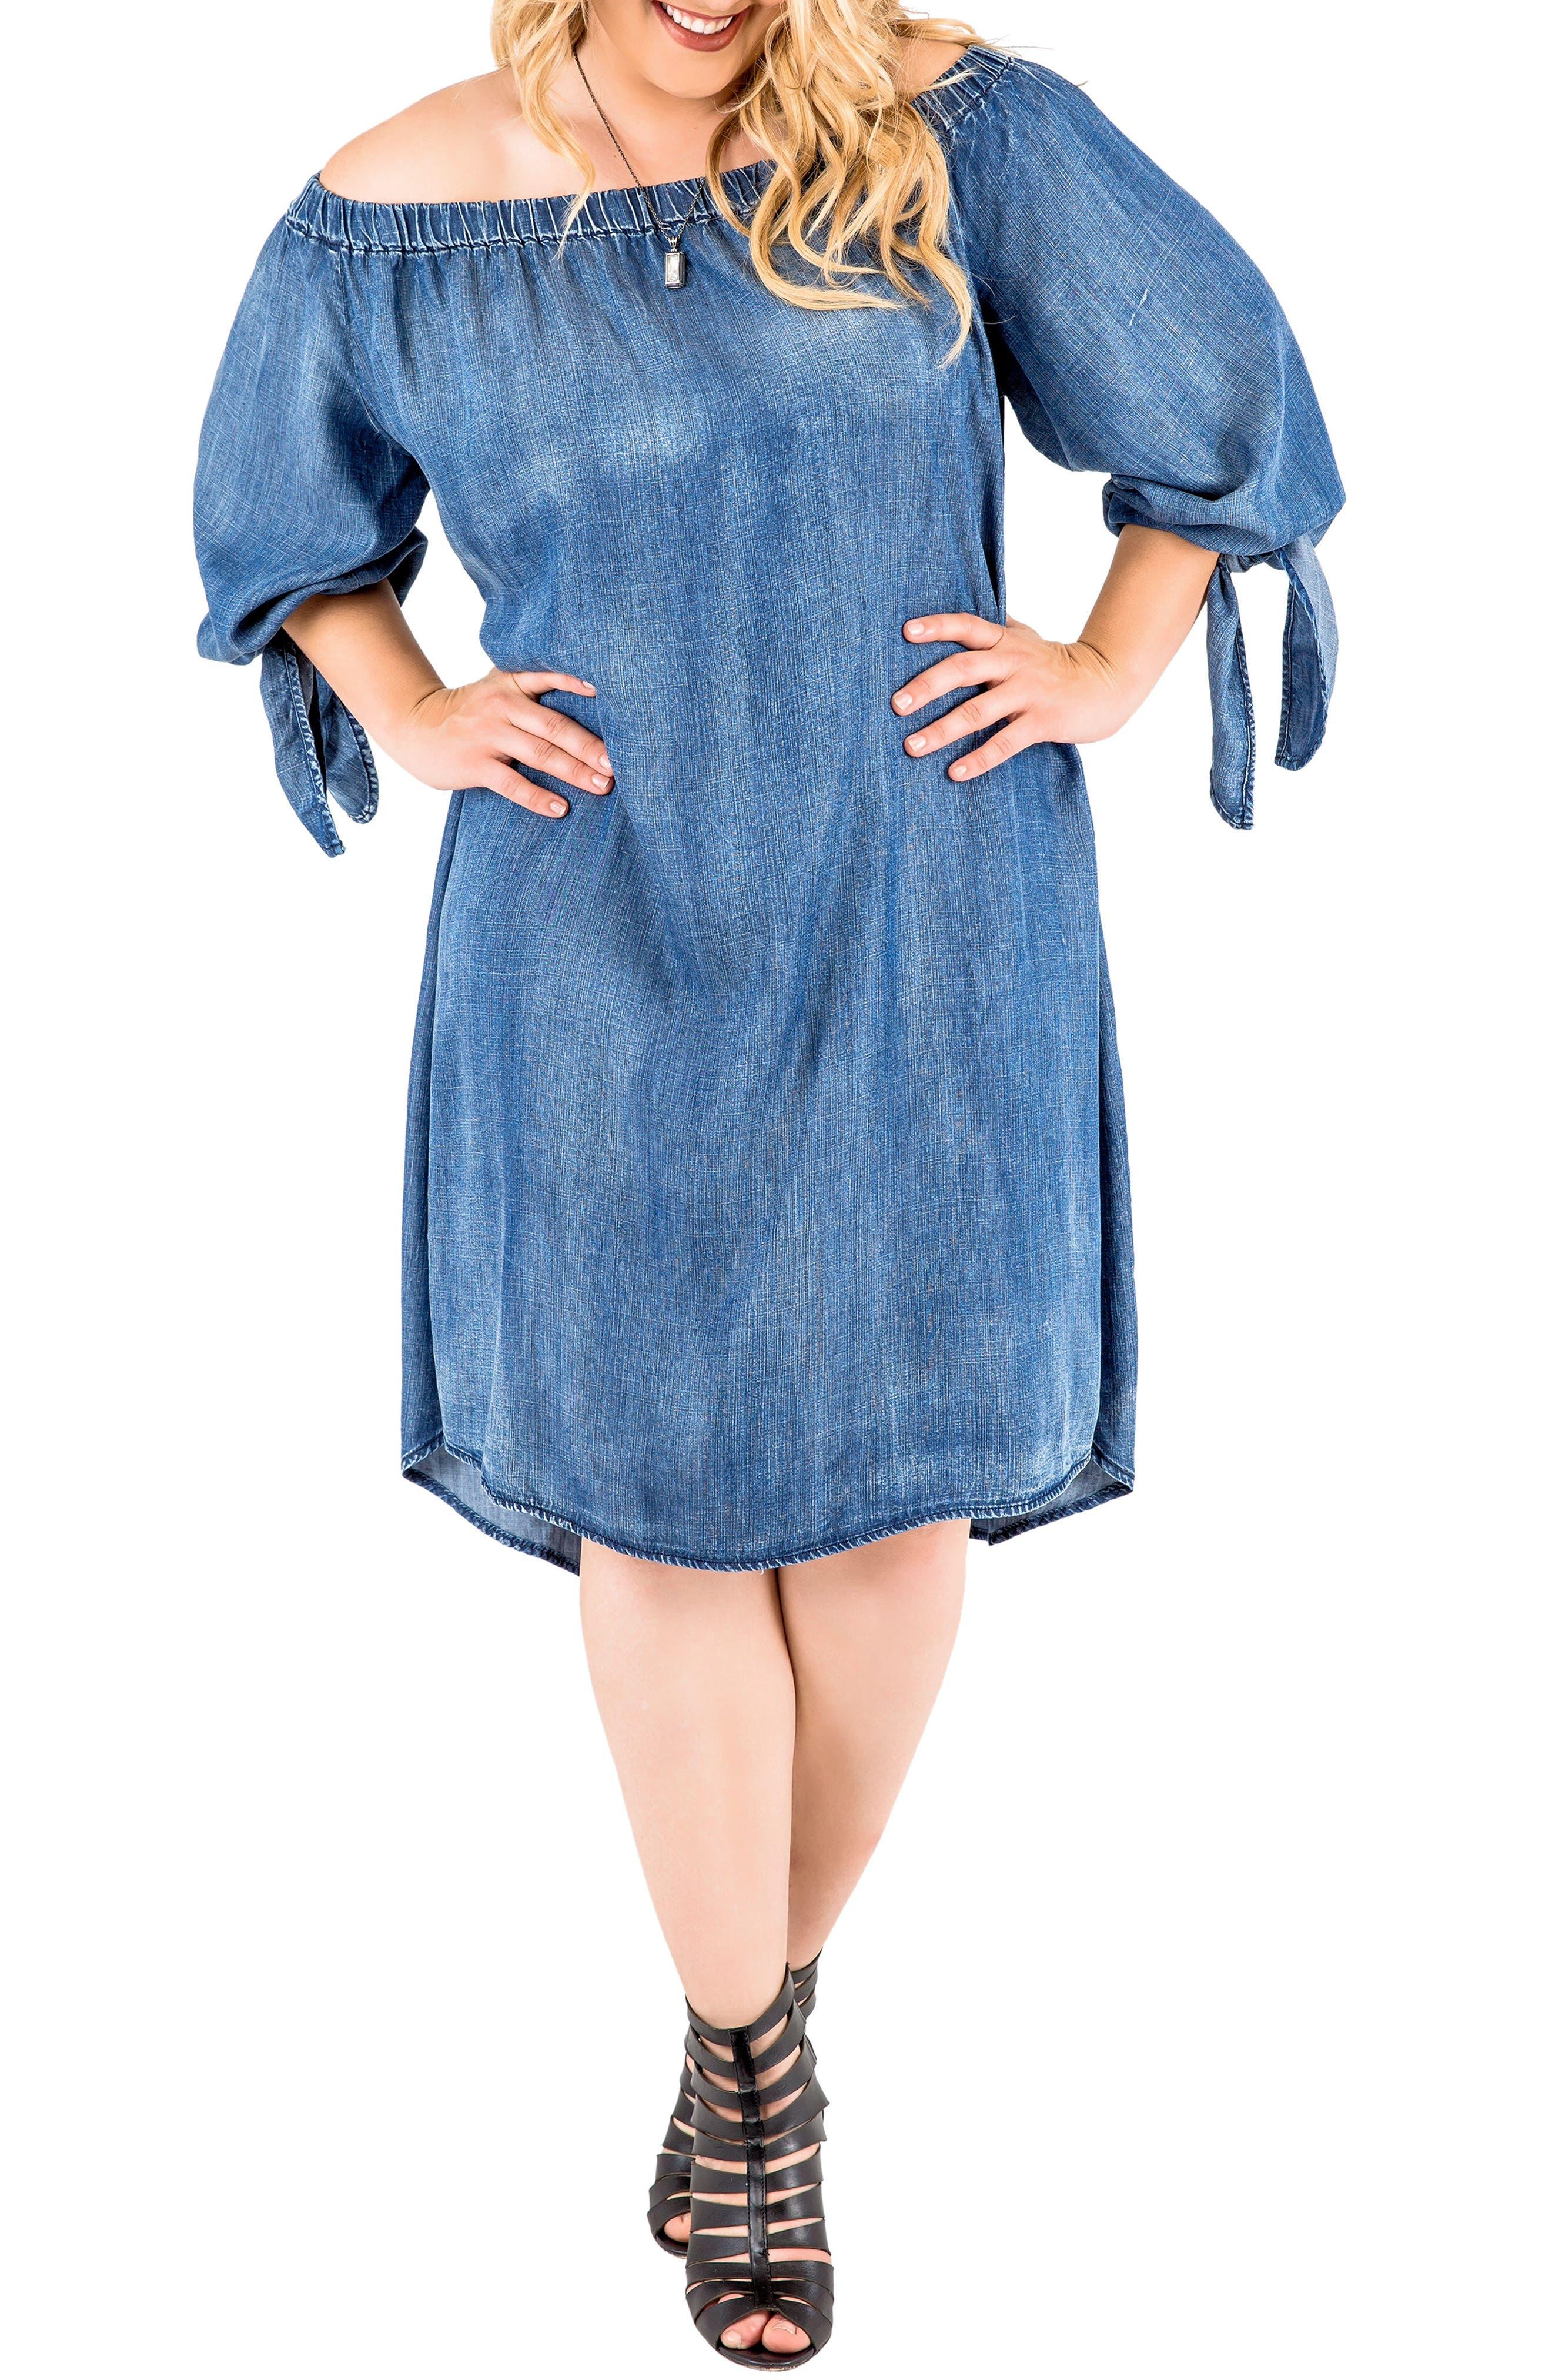 Julie Off the Shoulder Denim Dress,                             Main thumbnail 1, color,                             FROZEN POND